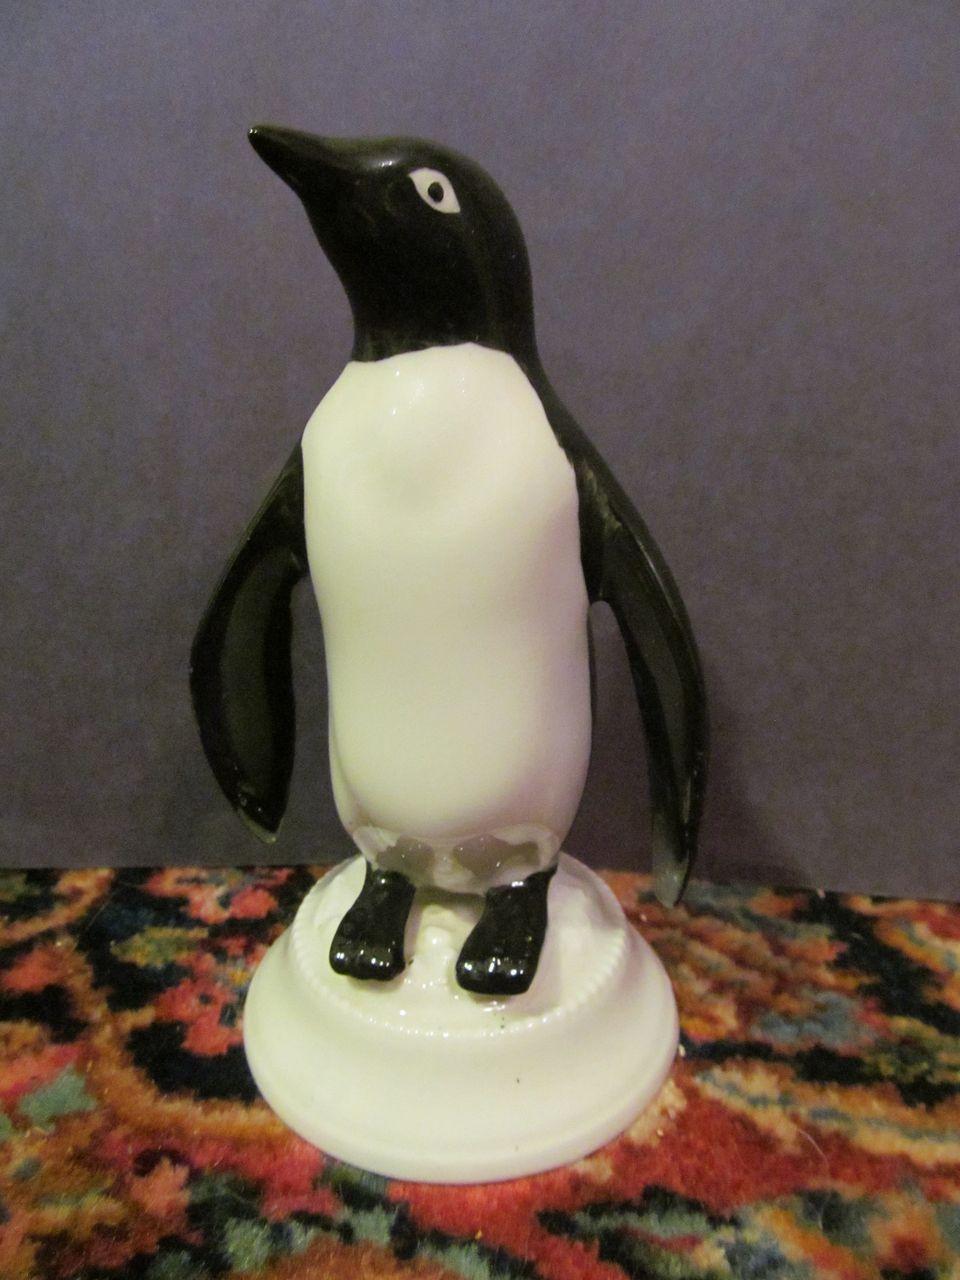 Kingwood Ceramics Penguin, Dwight Morris